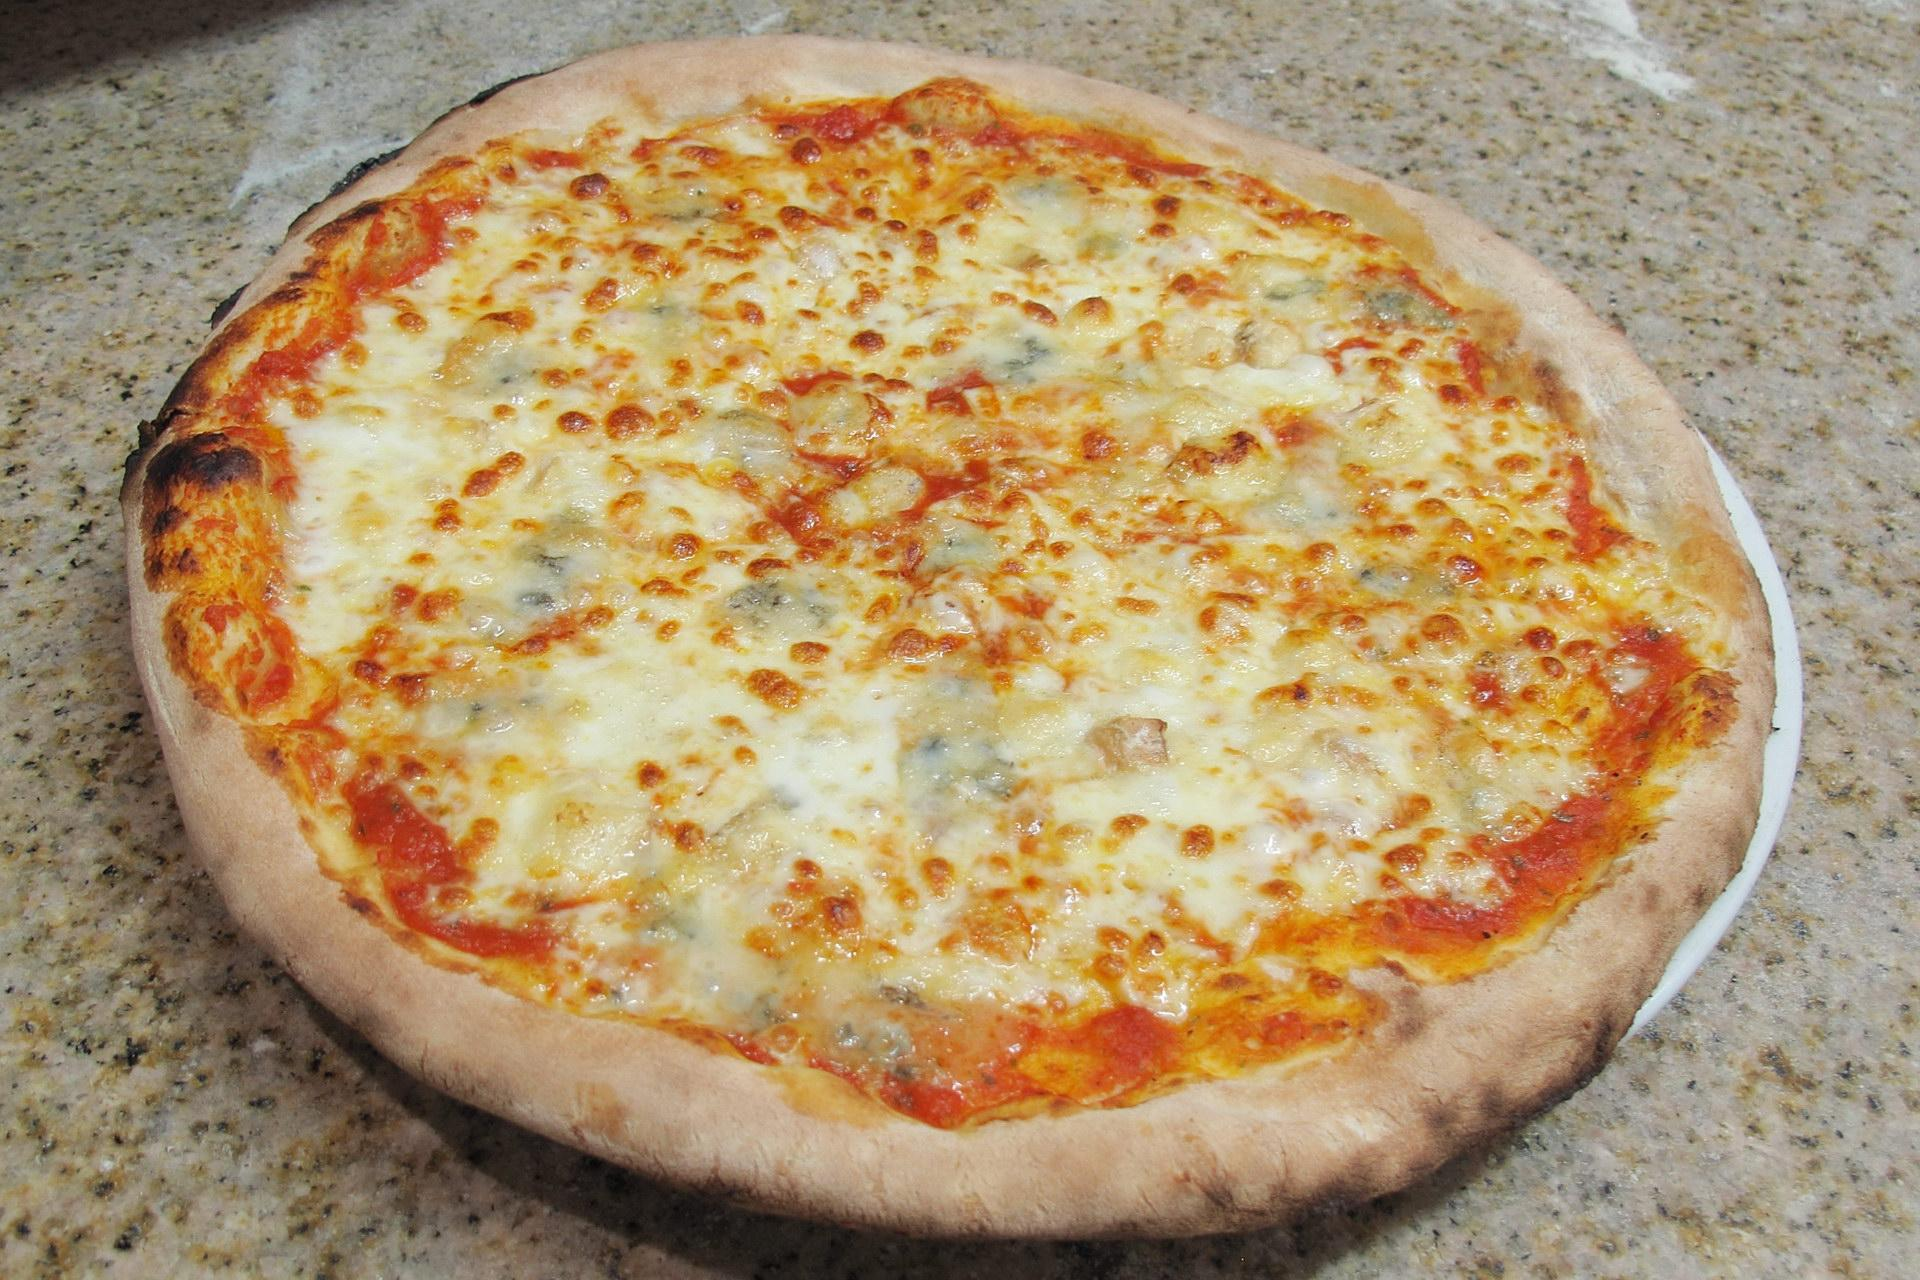 Le-Mediterraneen-Pizza-Braine-l-Alleud-0029.jpg